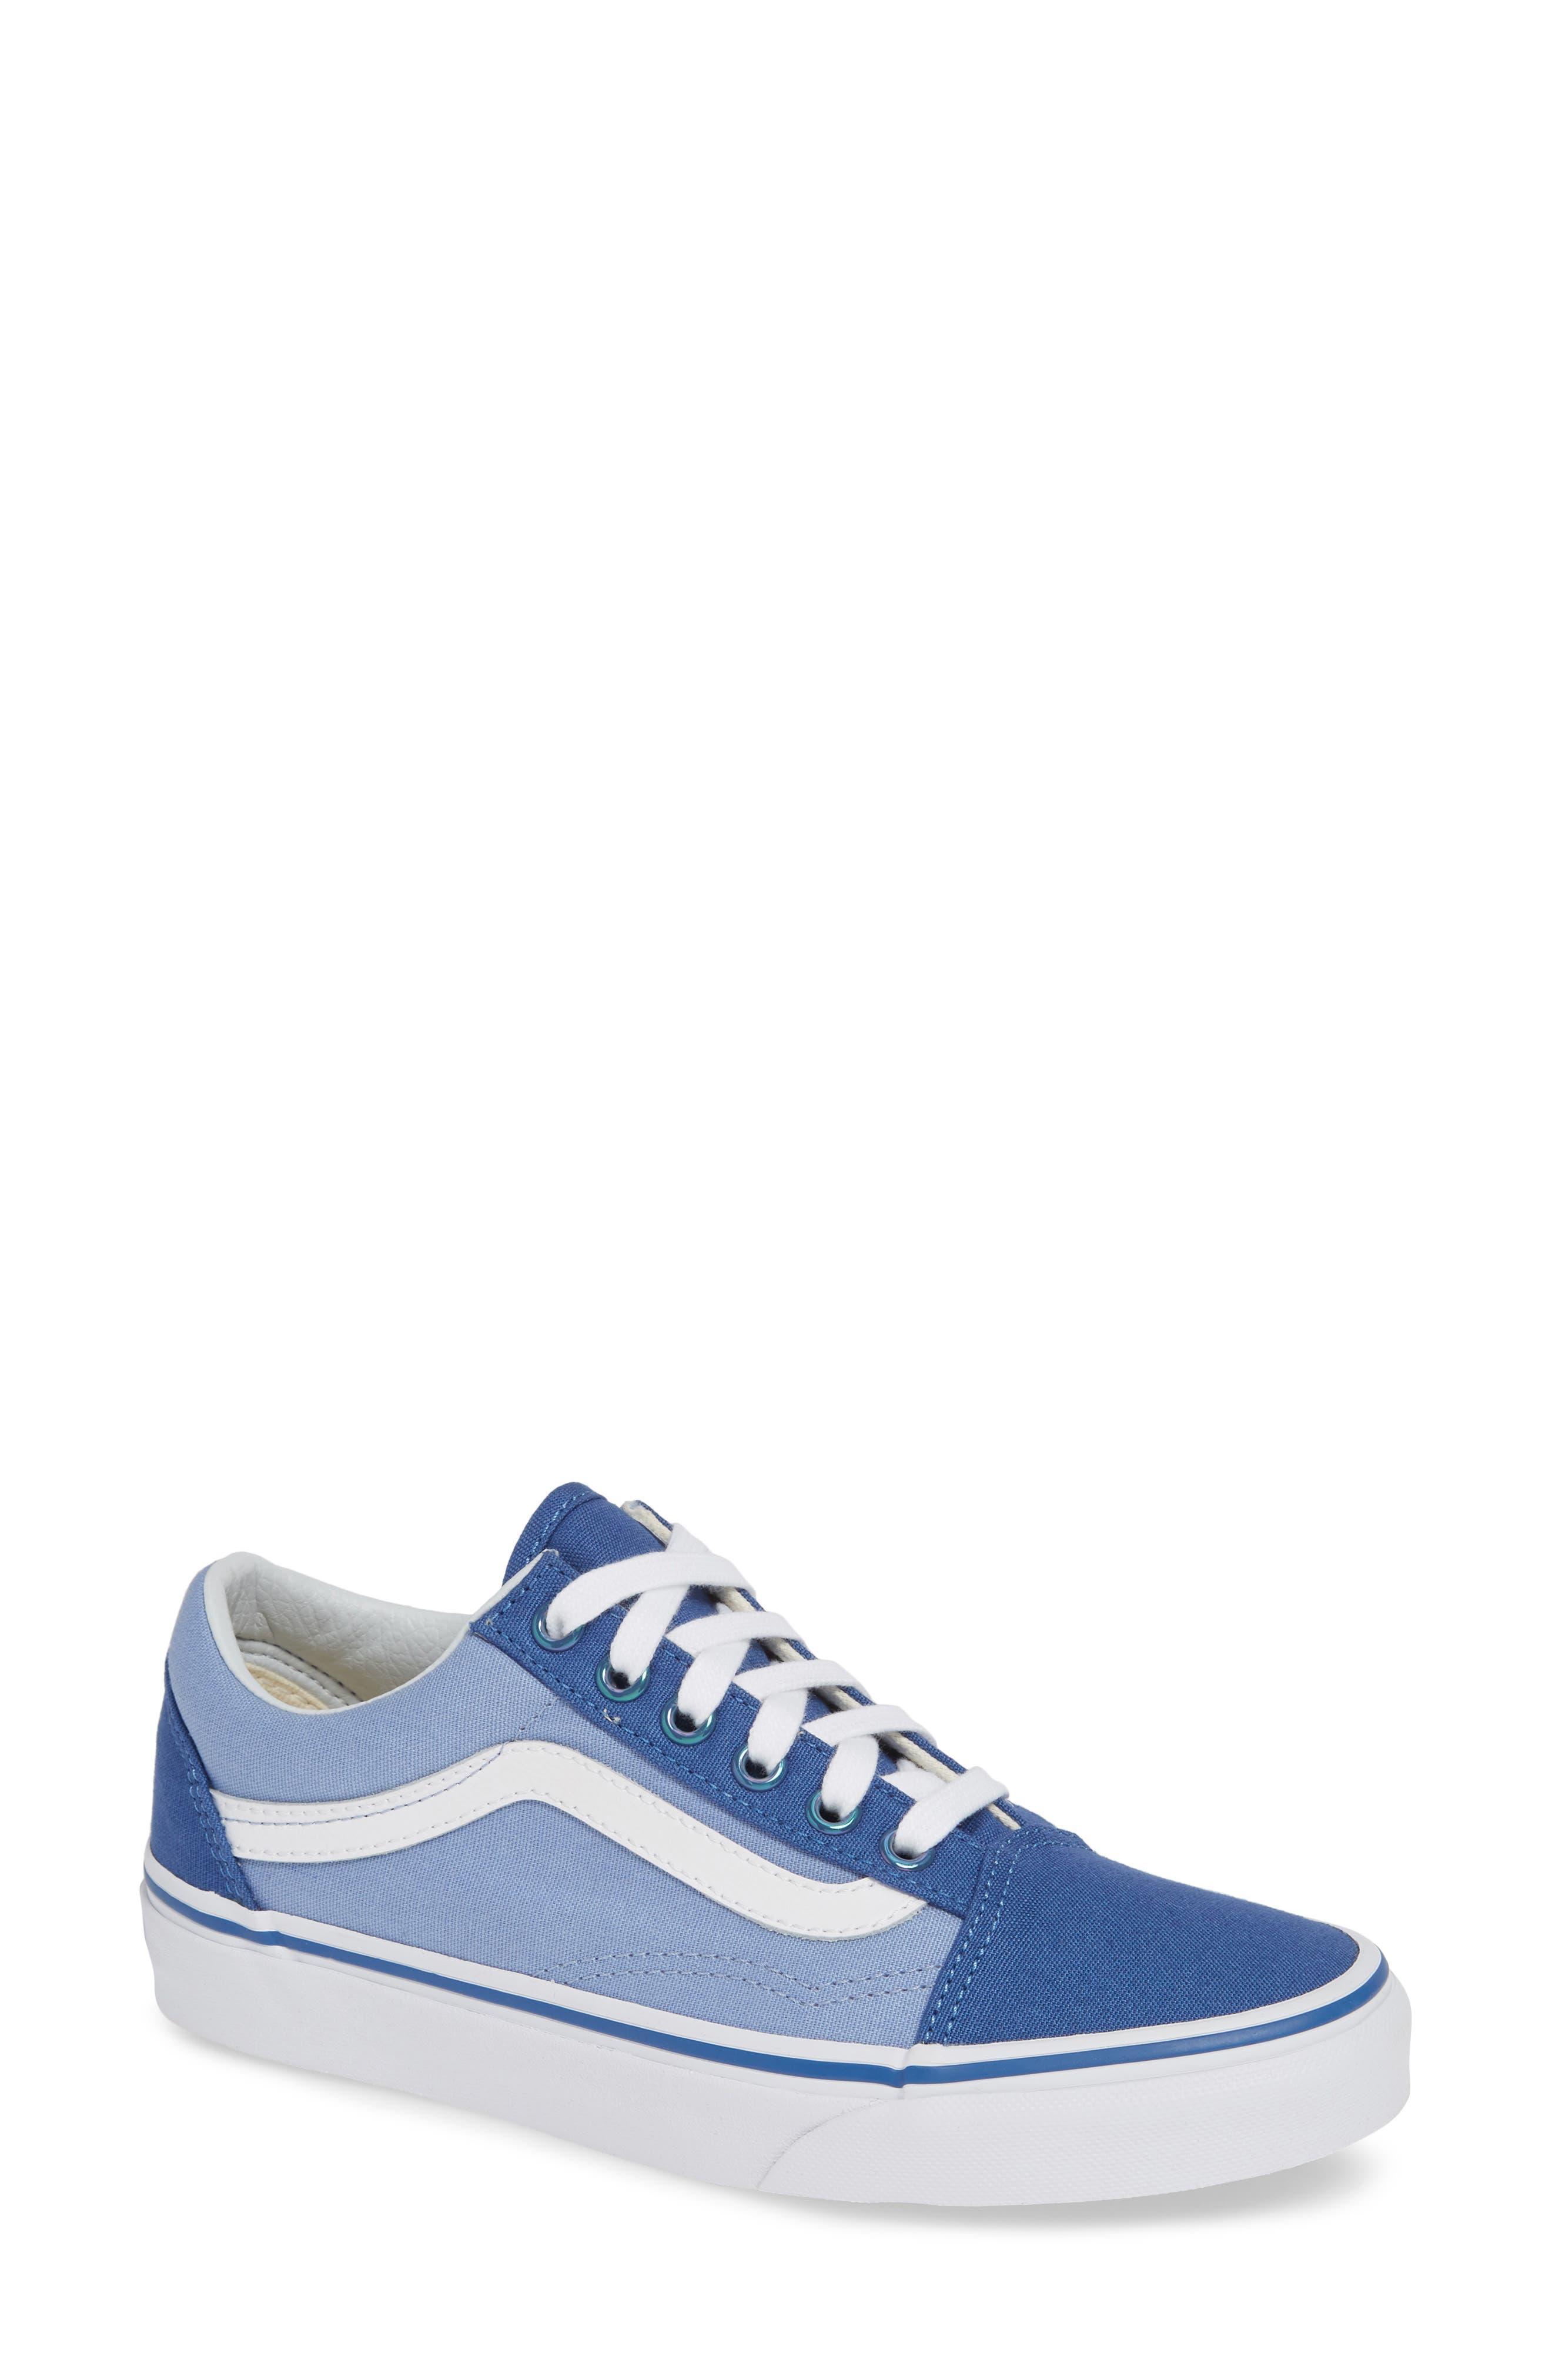 Old Skool Sneaker,                             Main thumbnail 1, color,                             FEDERAL BLUE/ LAVENDER LUSTER